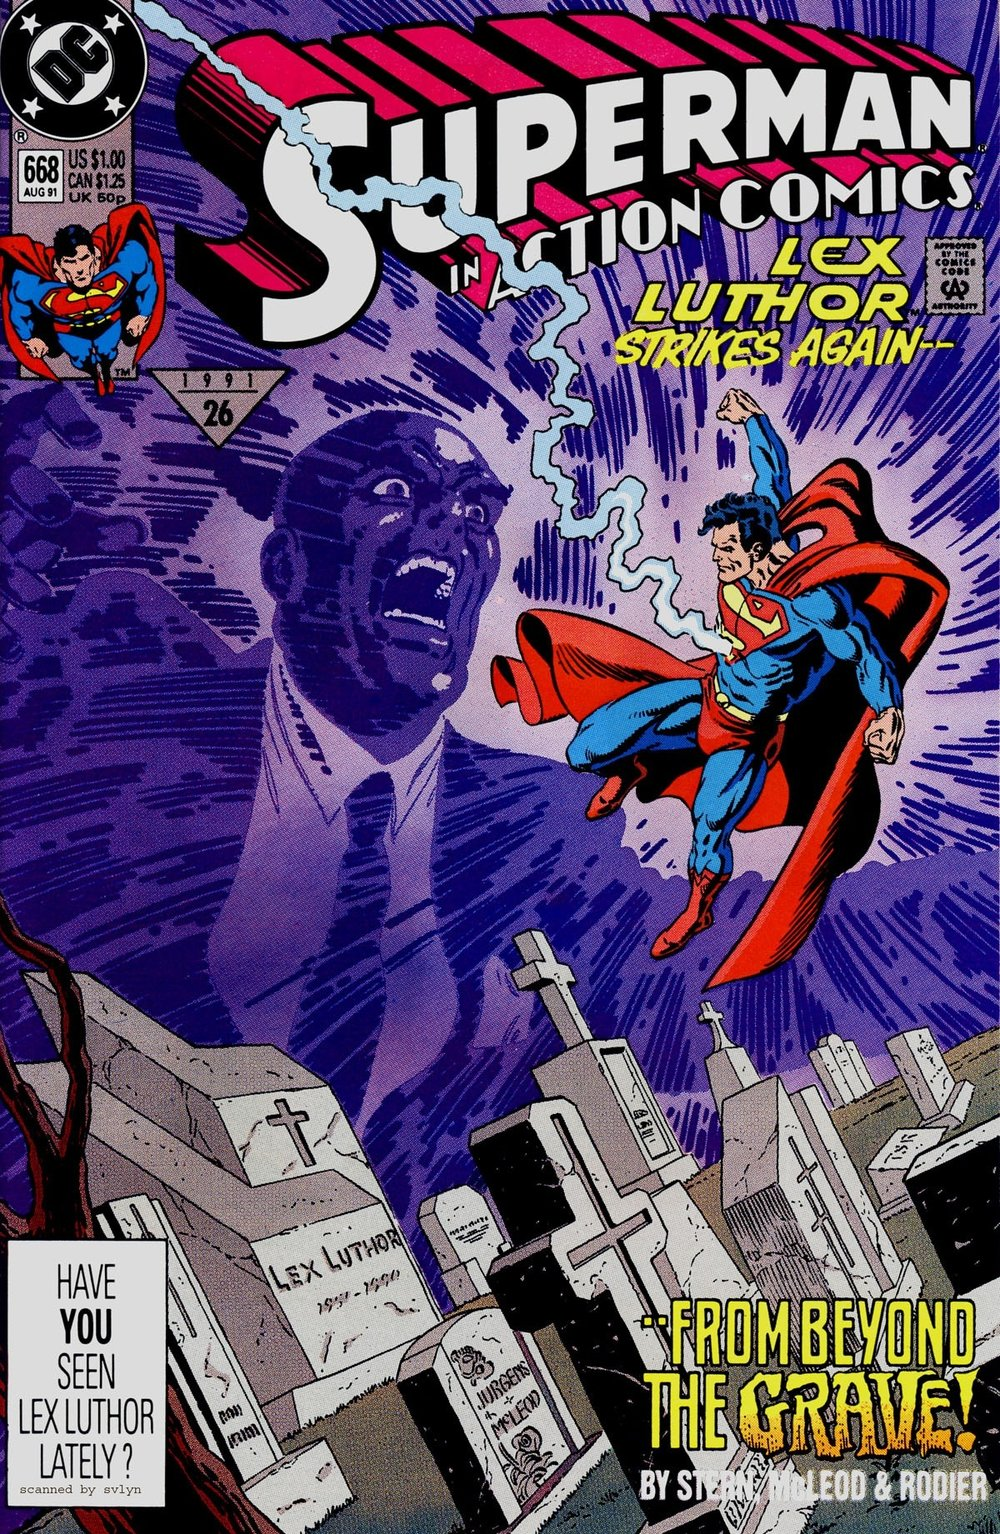 Action Comics (1938) #668, cover penciled by Dan Jurgens & inked by Bob McLeod.